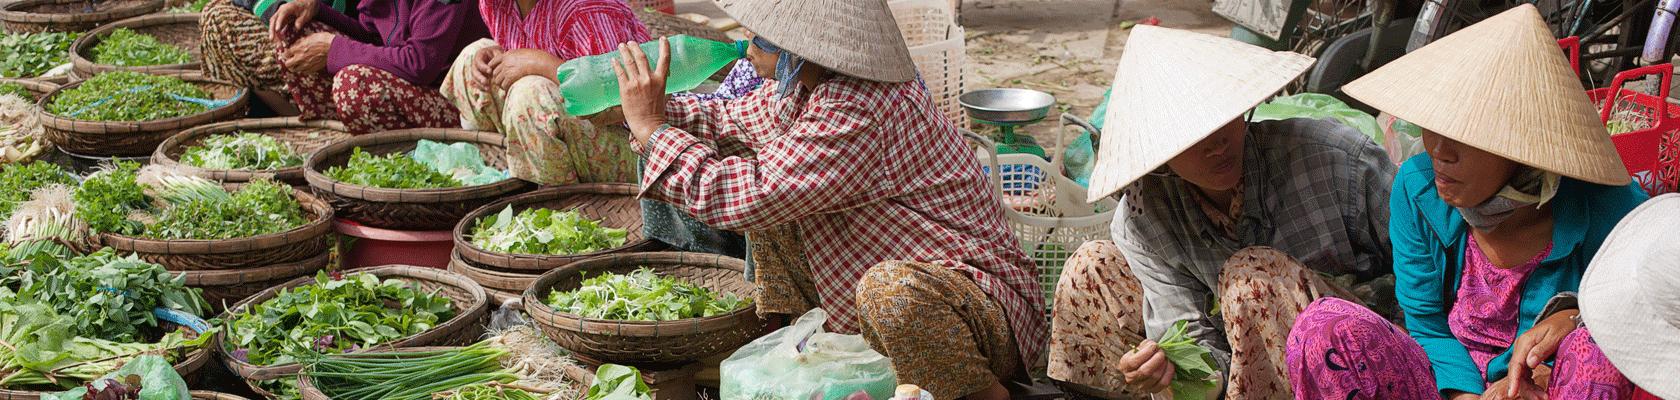 Lokale markt in Vietnam